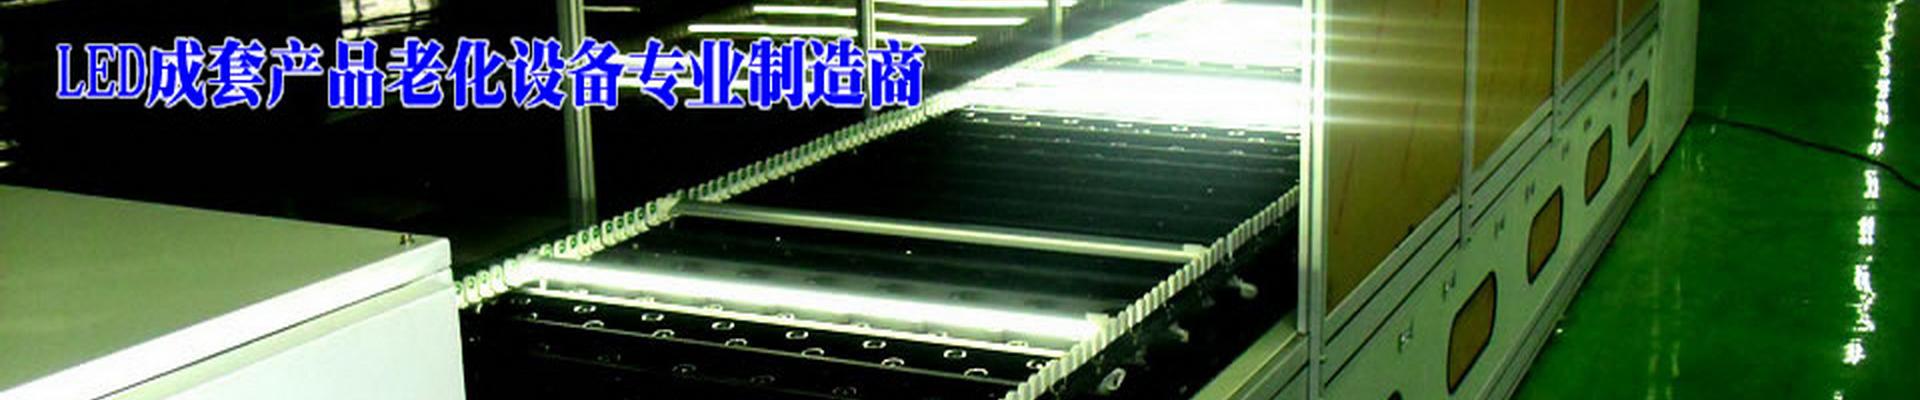 LED燈管老化線